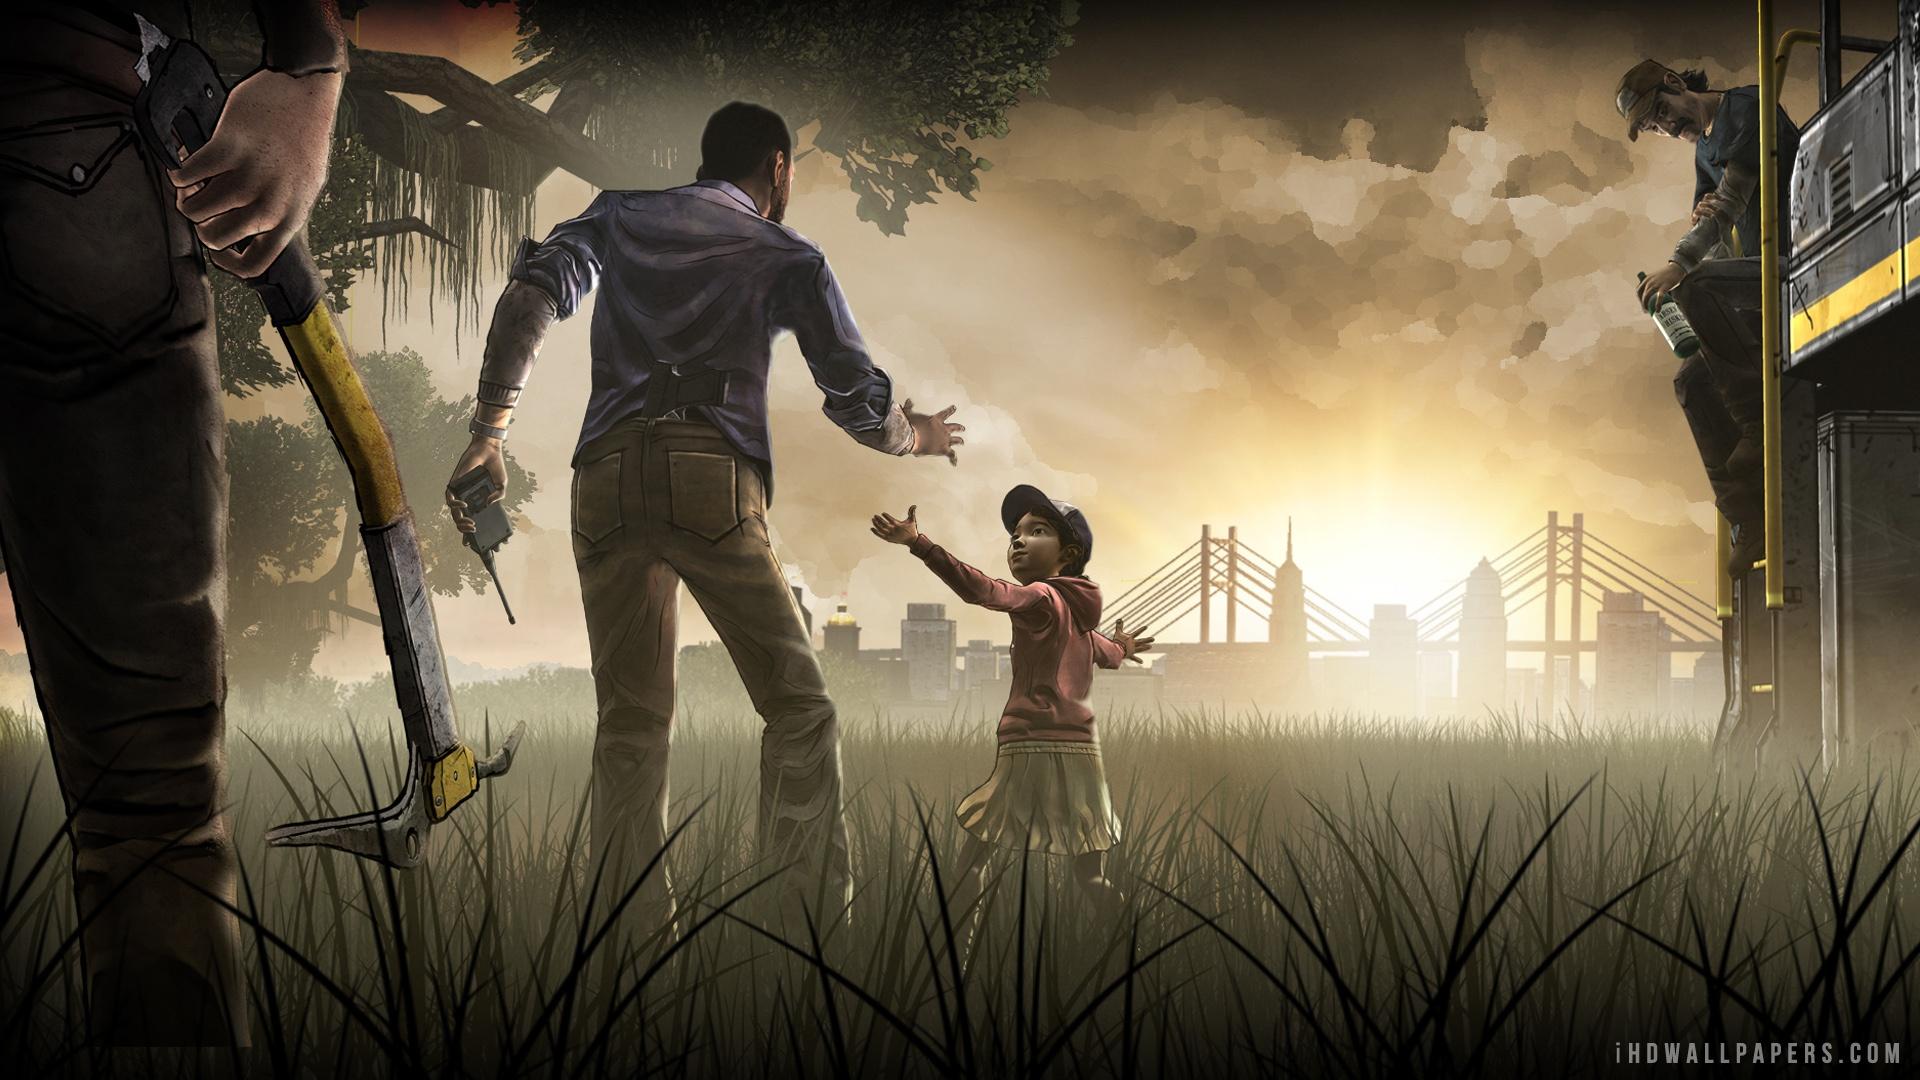 The Walking Dead Game HD Wallpaper   iHD Wallpapers 1920x1080